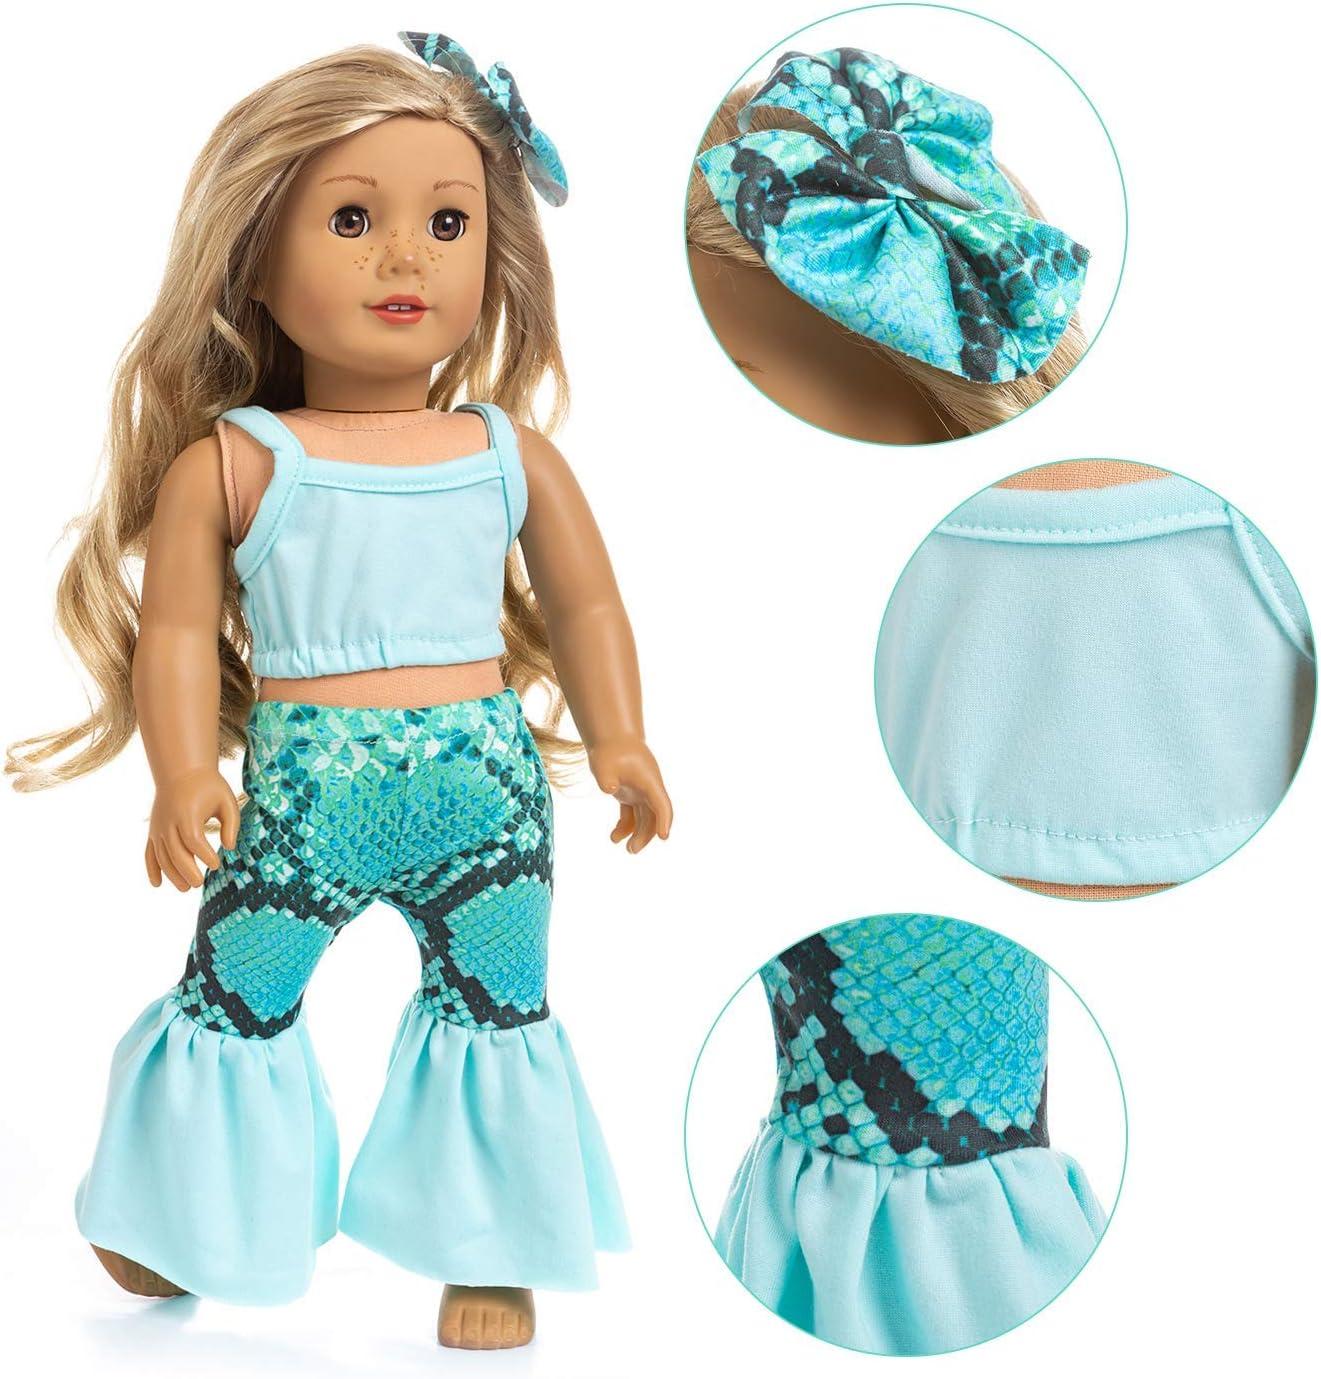 18 Inch Doll Accessories for American Doll Clothes Bikini /& Cap Sets